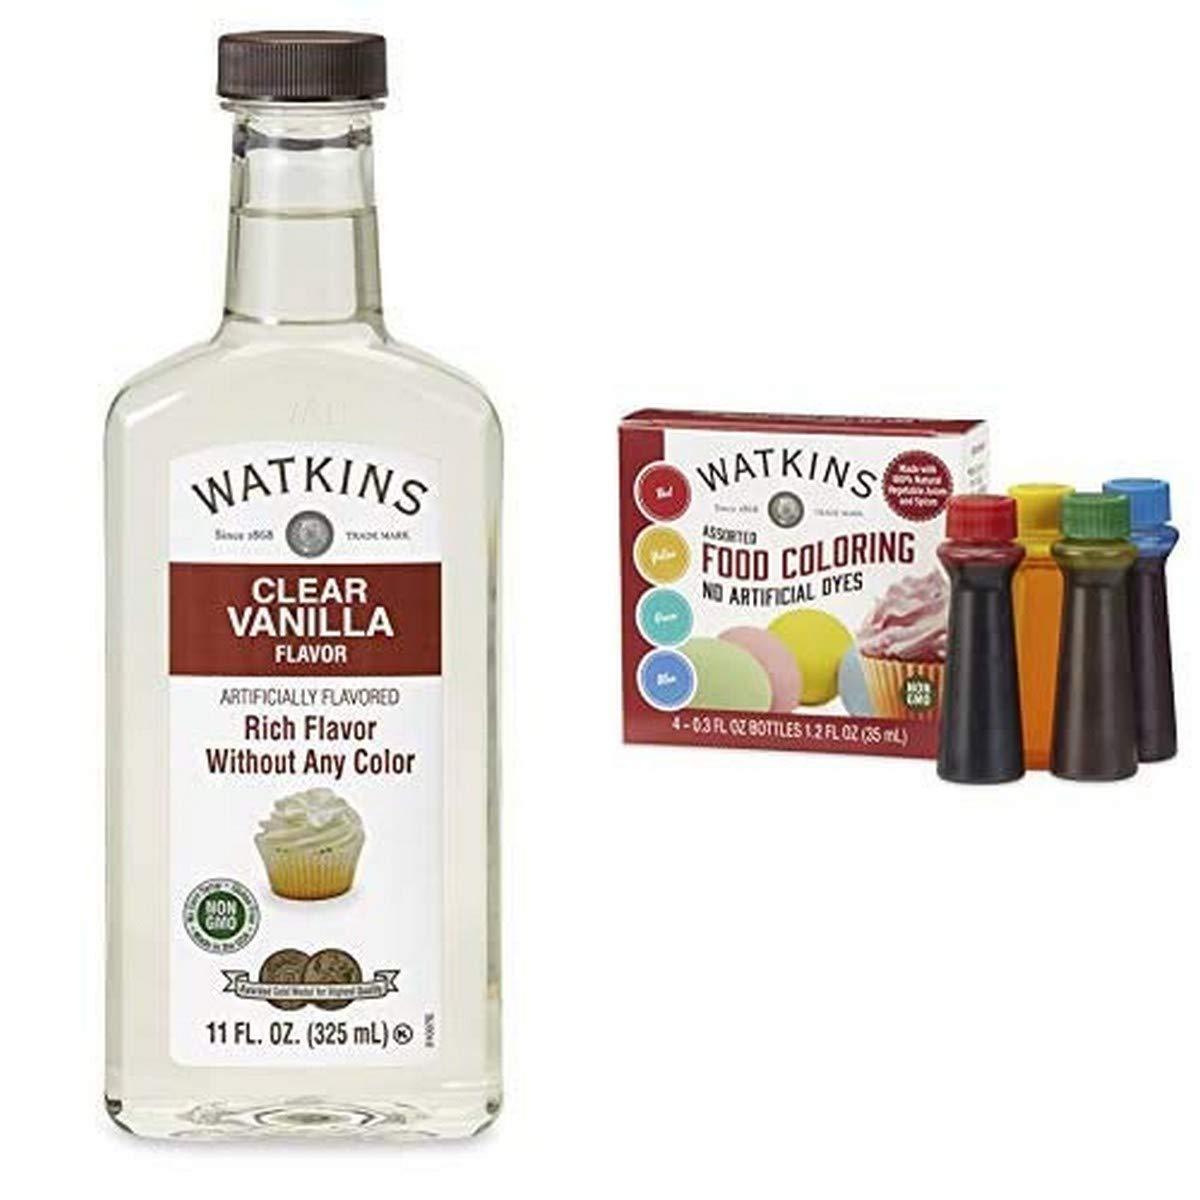 Watkins Clear Vanilla Extract & 4-Color Food Coloring Bundle